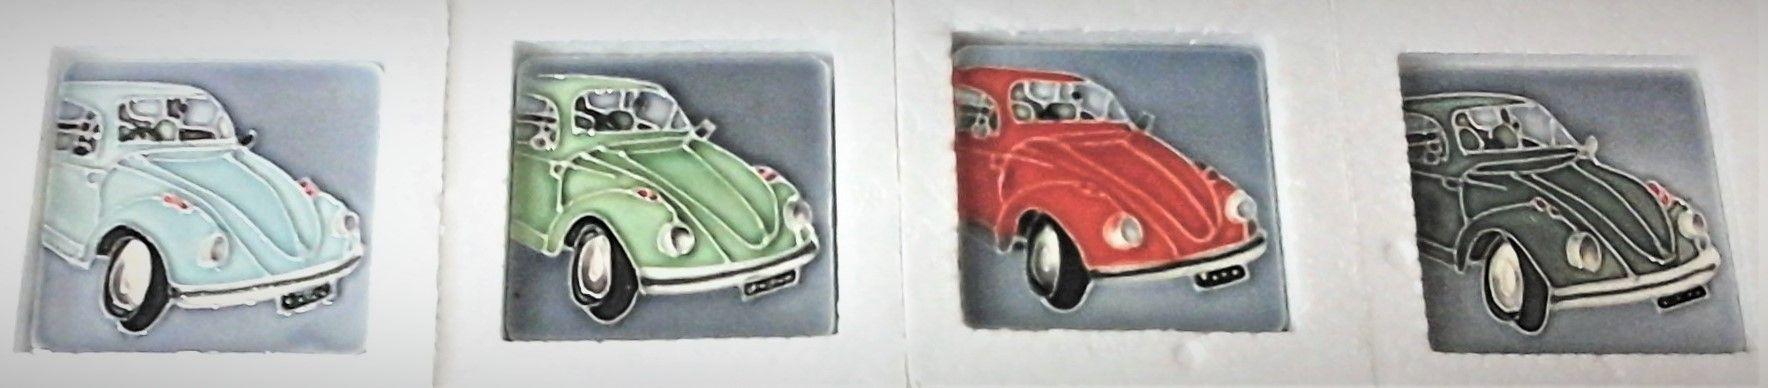 05358 VW Beetle Ceramic Magnets